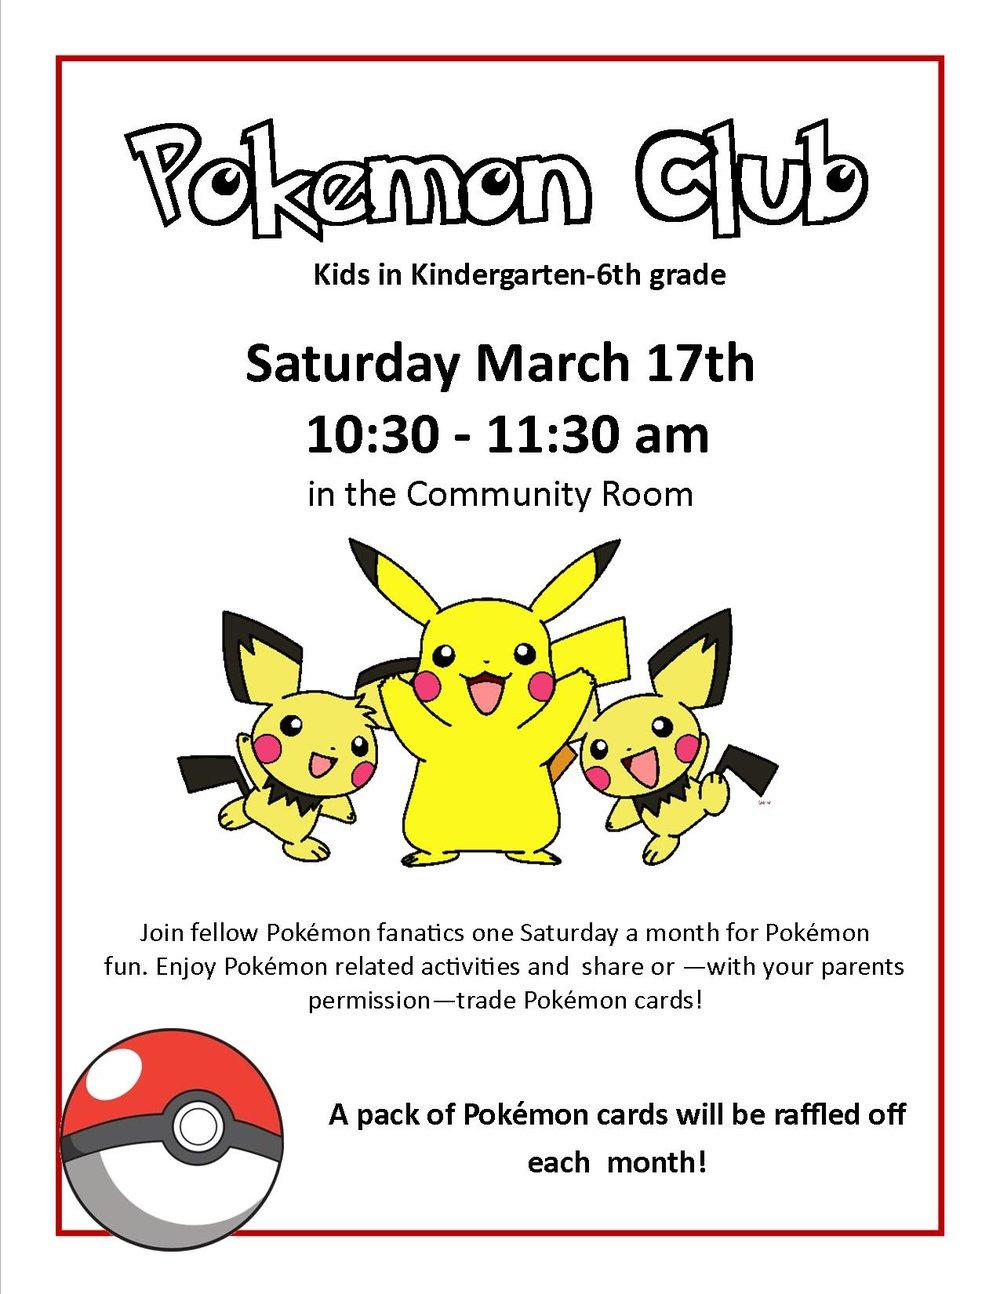 Pokemon club flyer March.jpg